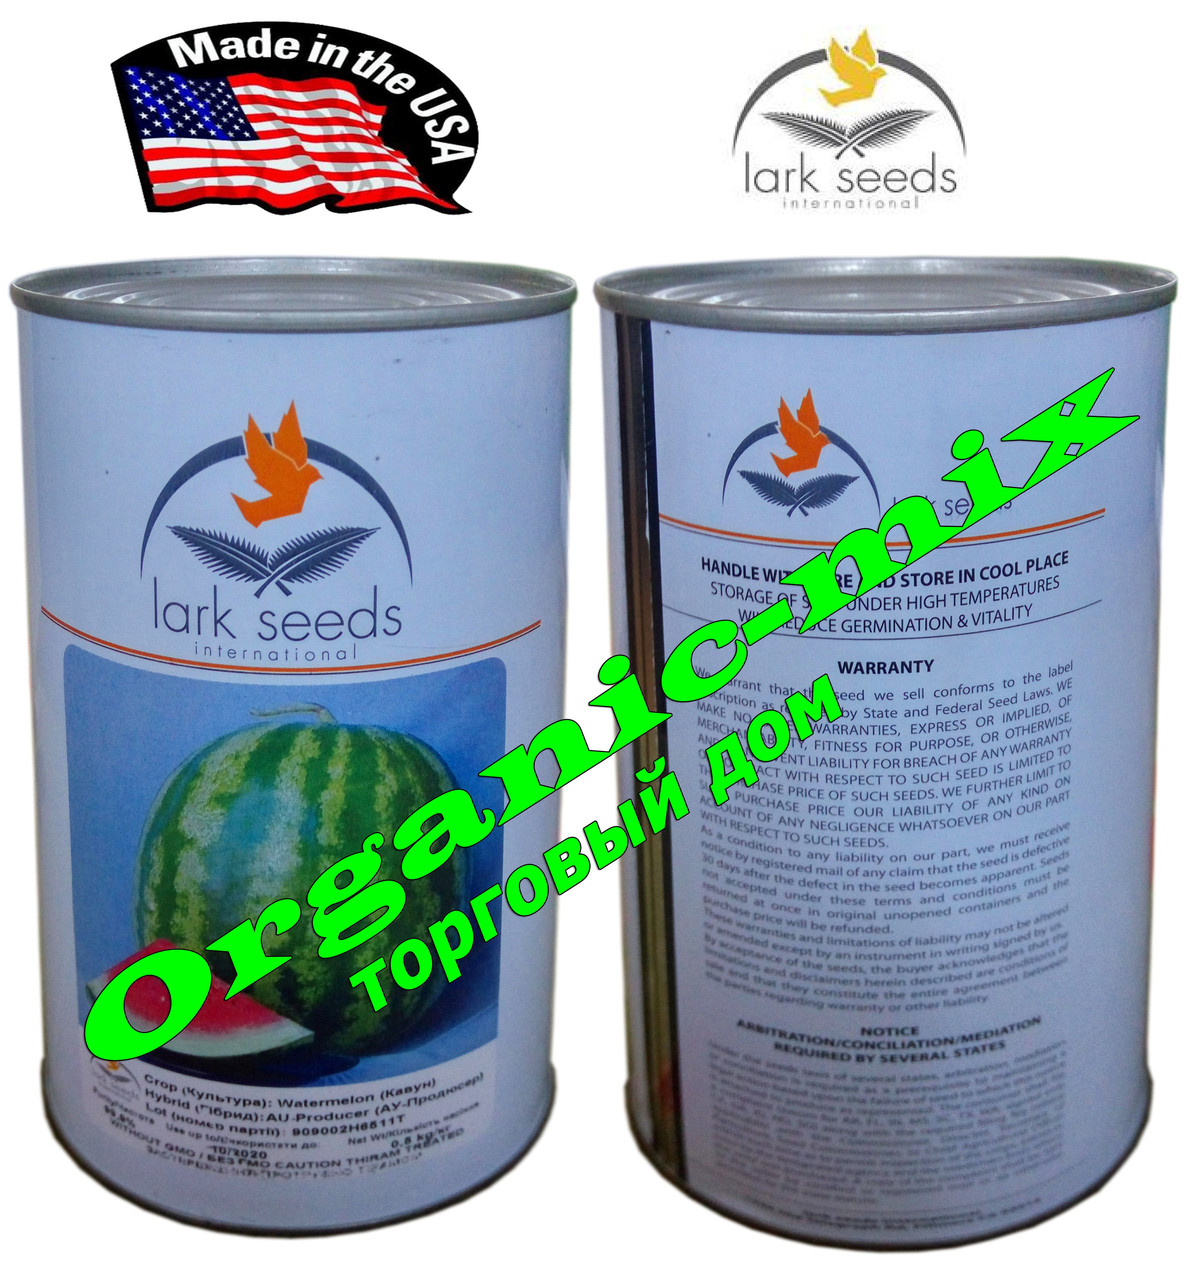 АУ-ПРОДЮСЕР / AU-PRODUCER (ранний), семена арбуза, Lark Seeds (США), банка 500 грамм, ИМПОРТ 2020